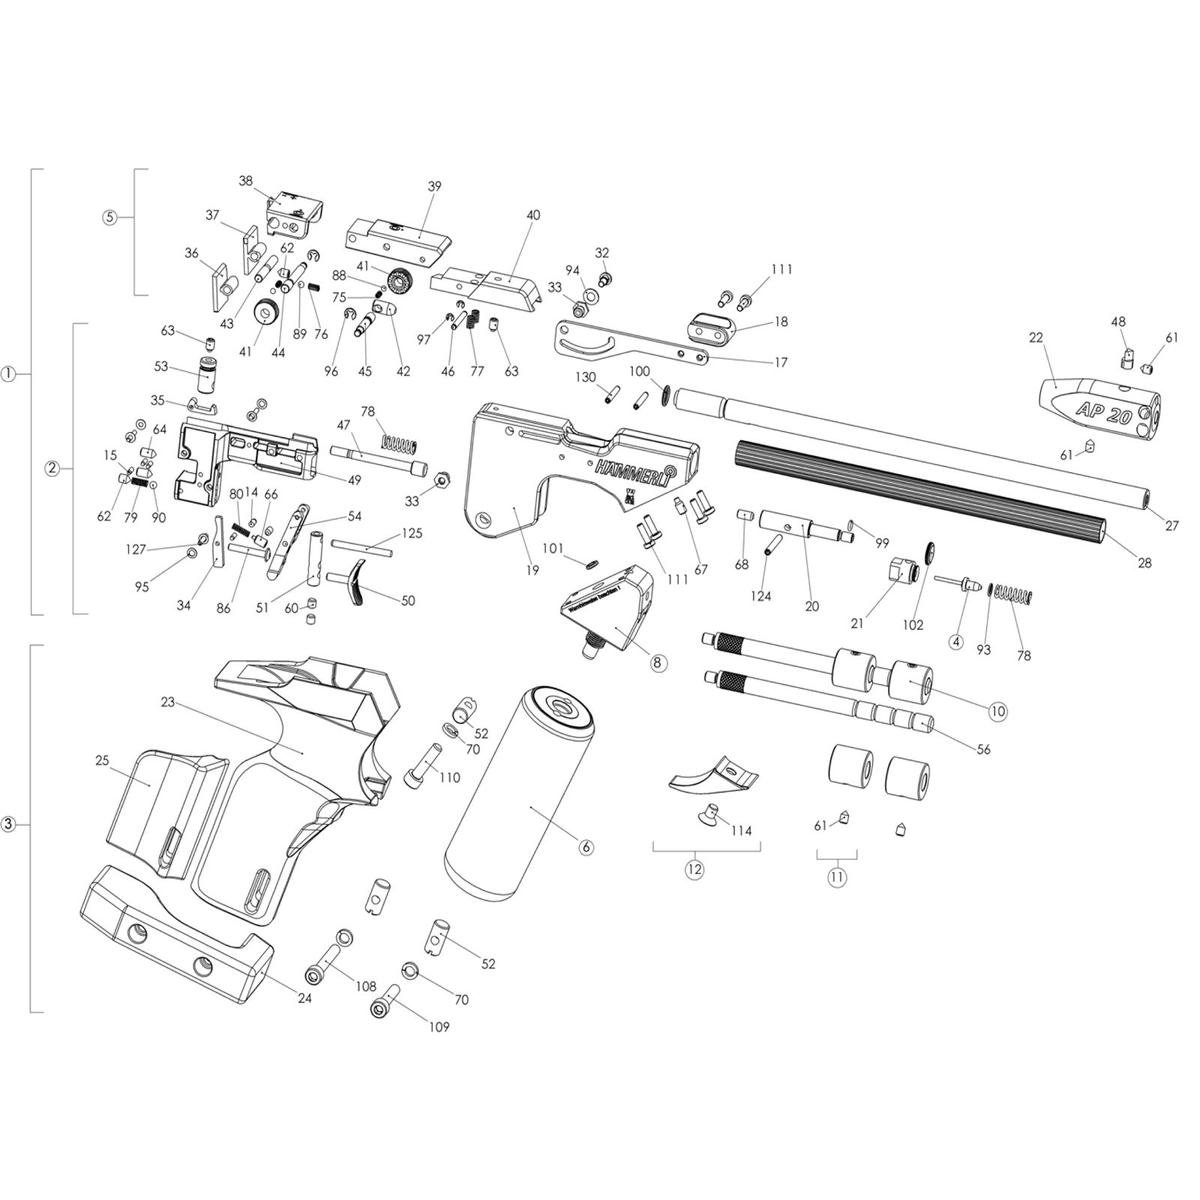 Amazon com : Bisley Hammerli AP20 Spare Parts : Sports